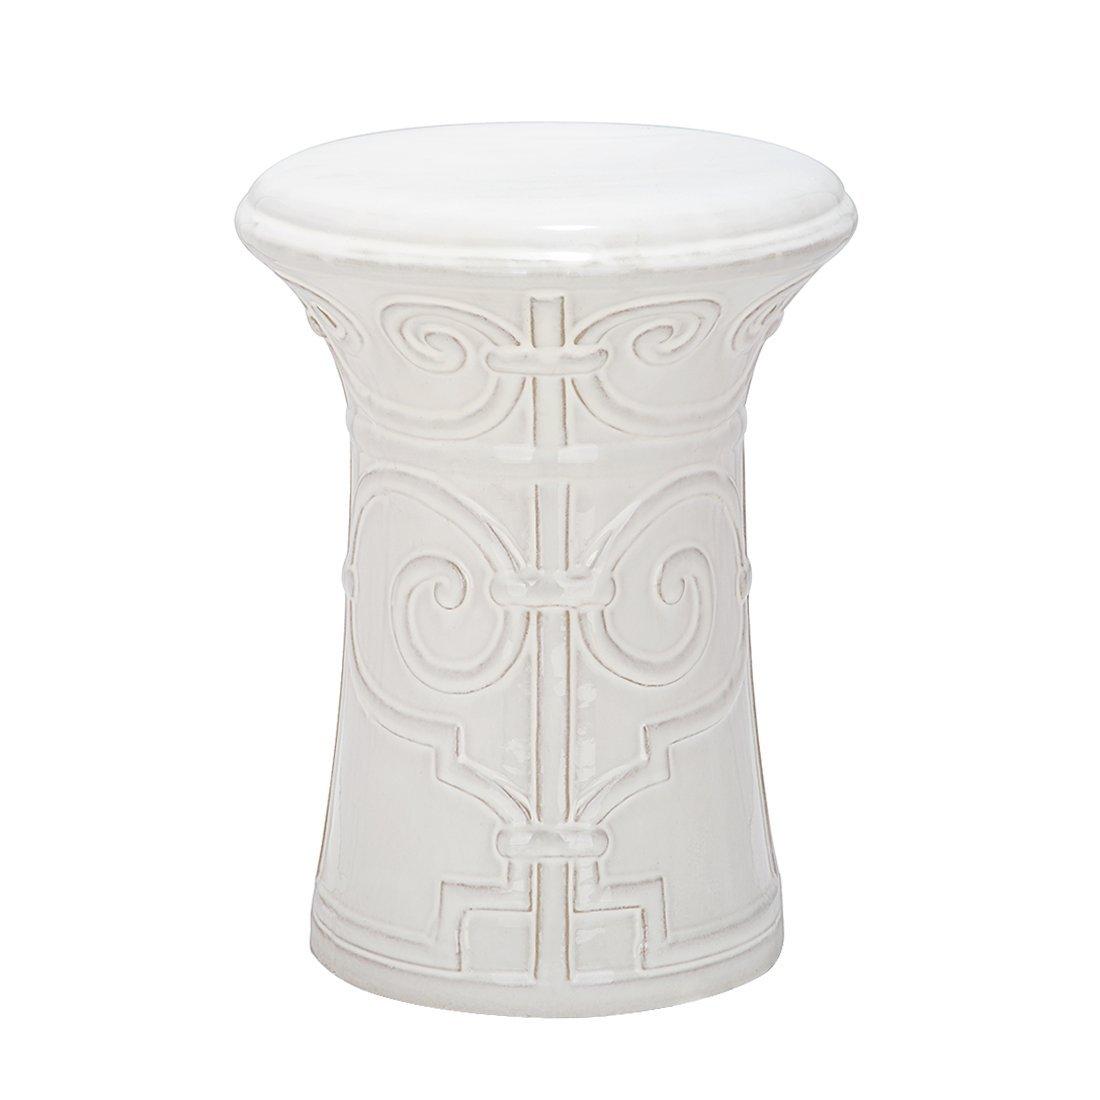 Gartenhocker Imperial Scroll Farbe: Weiß